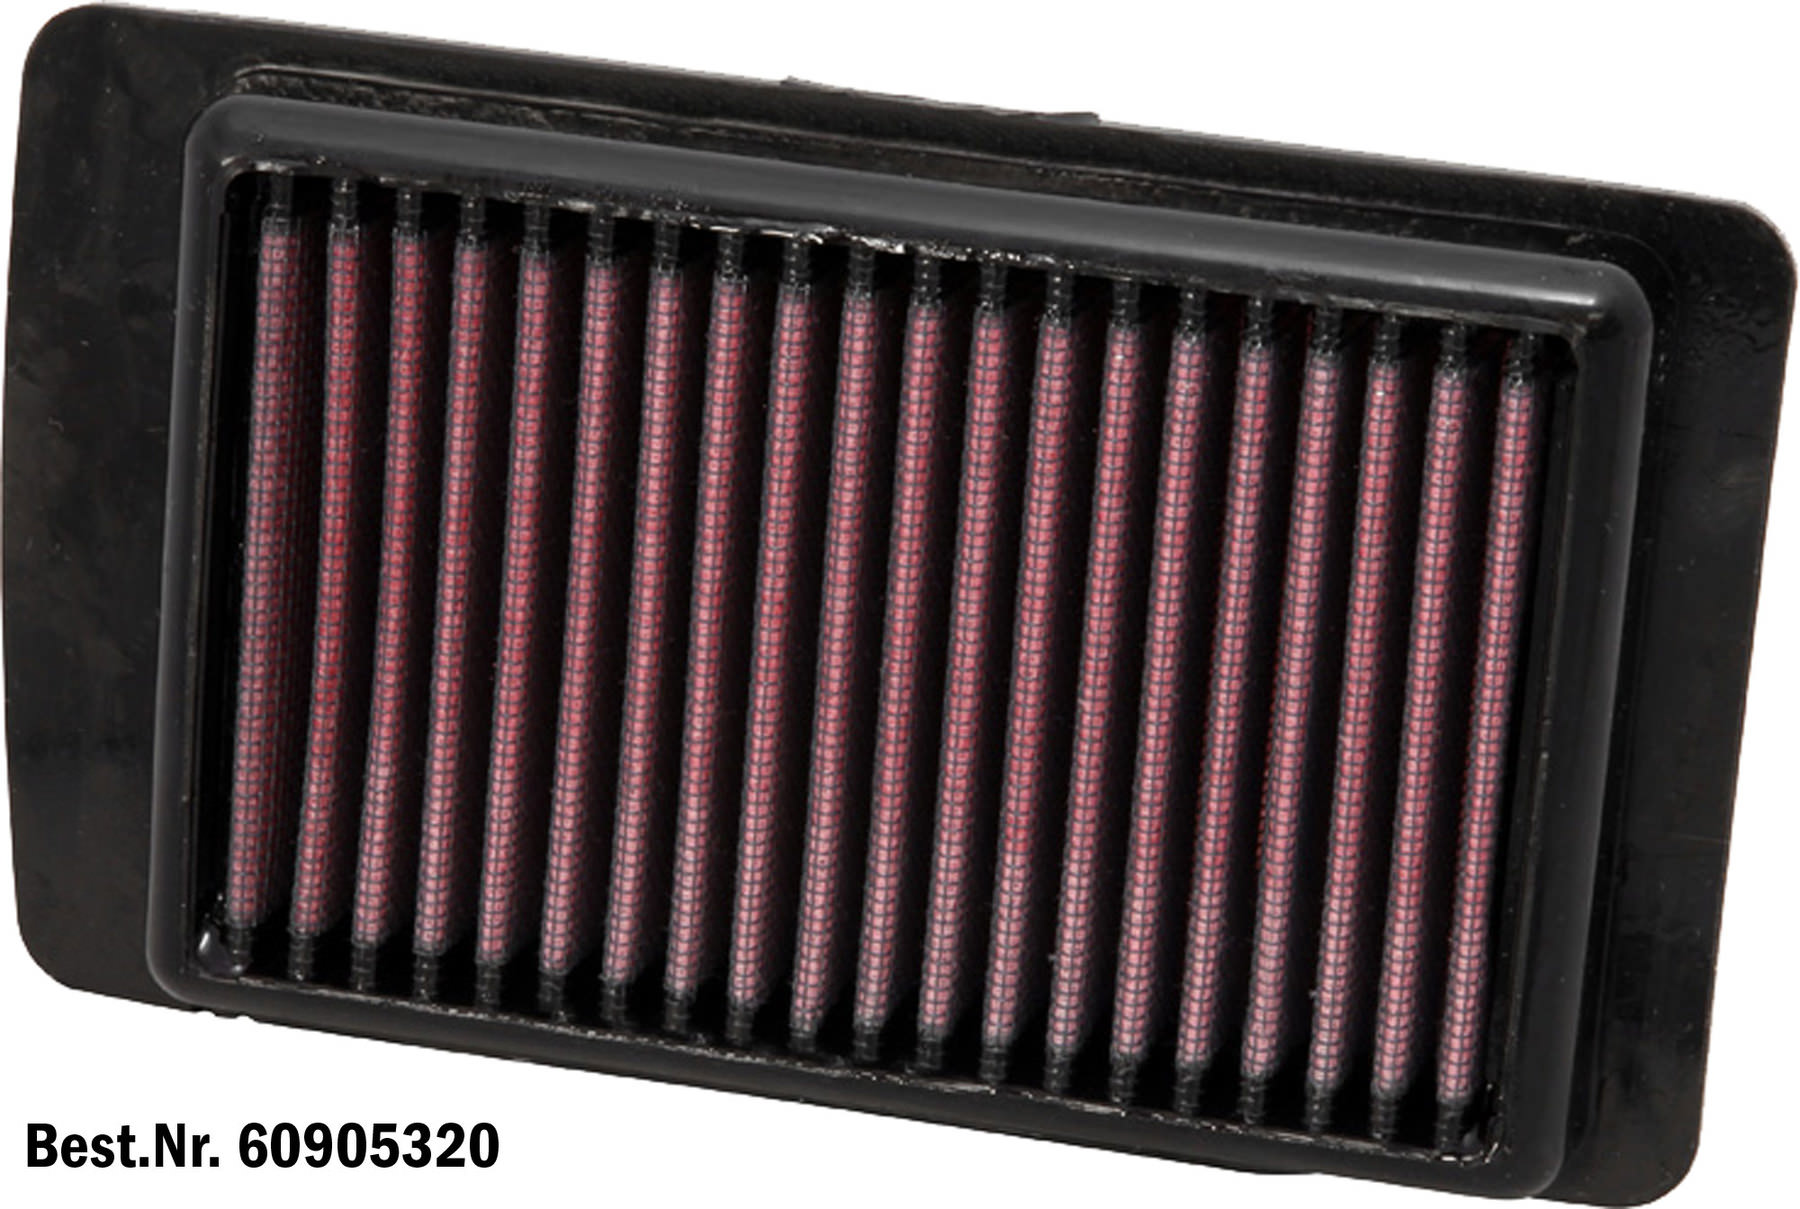 K /& N Filtro aria sportivo bm-0400 per BMW R motociclette